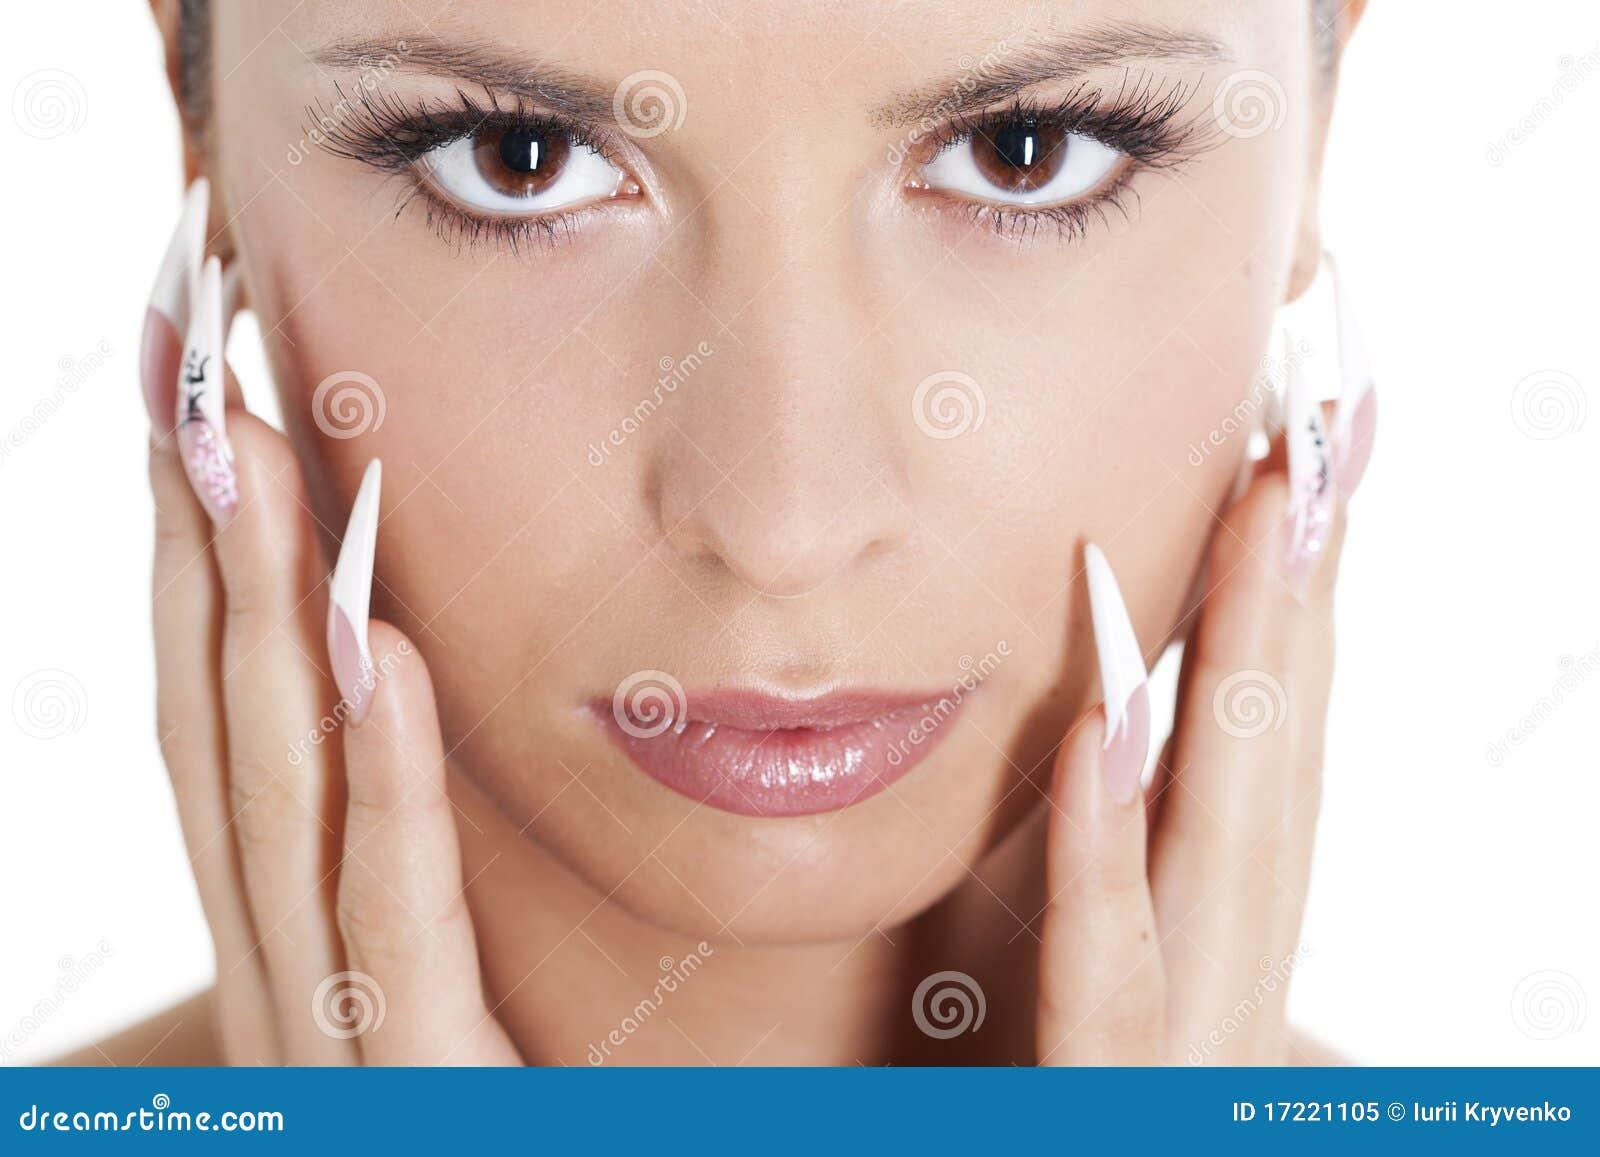 El Brunette con natural compone y manicure